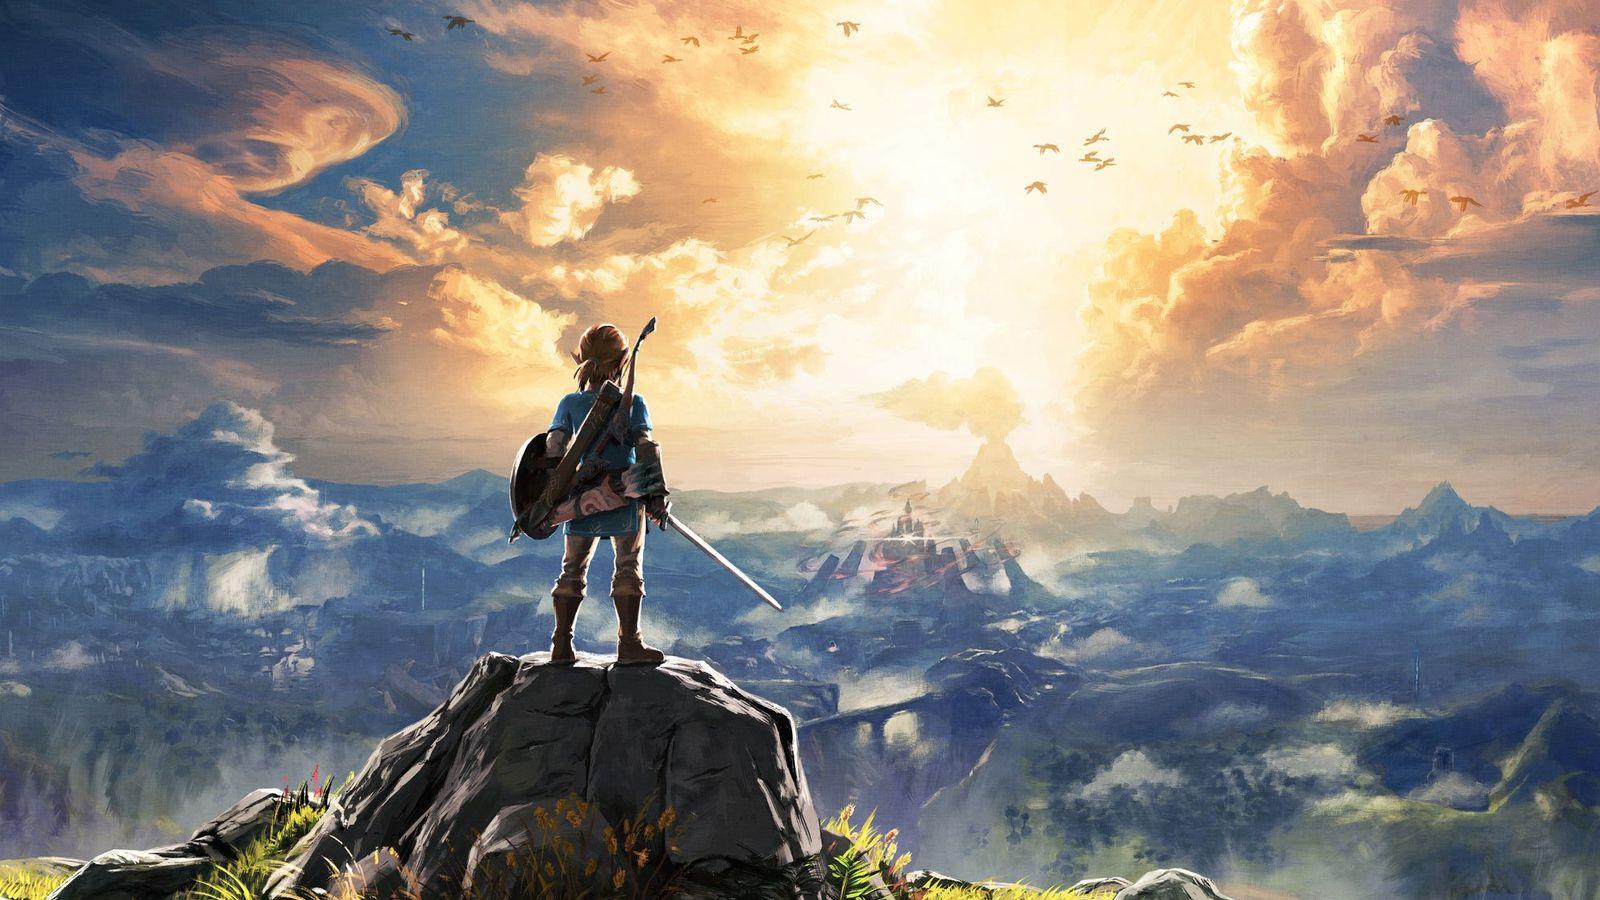 Jurassik Park elefanti rosa Super Mario Zelda Breath of the Wild